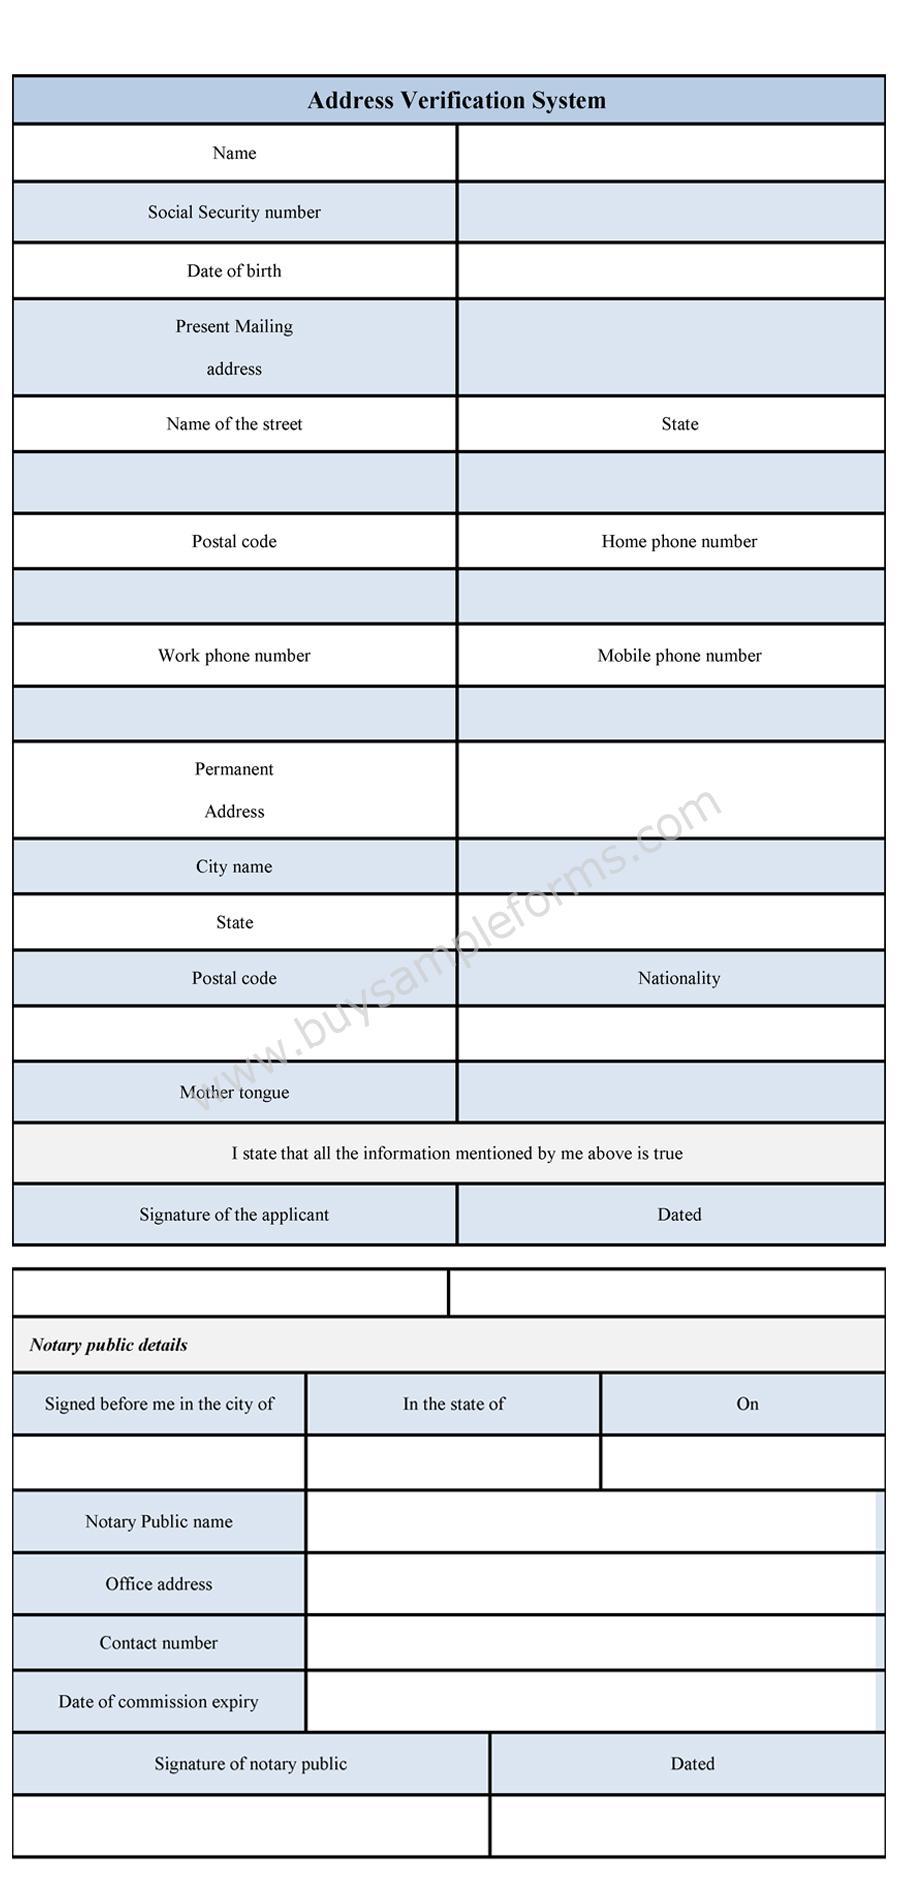 envelope address template sample free download address change – Change of Address Form Template